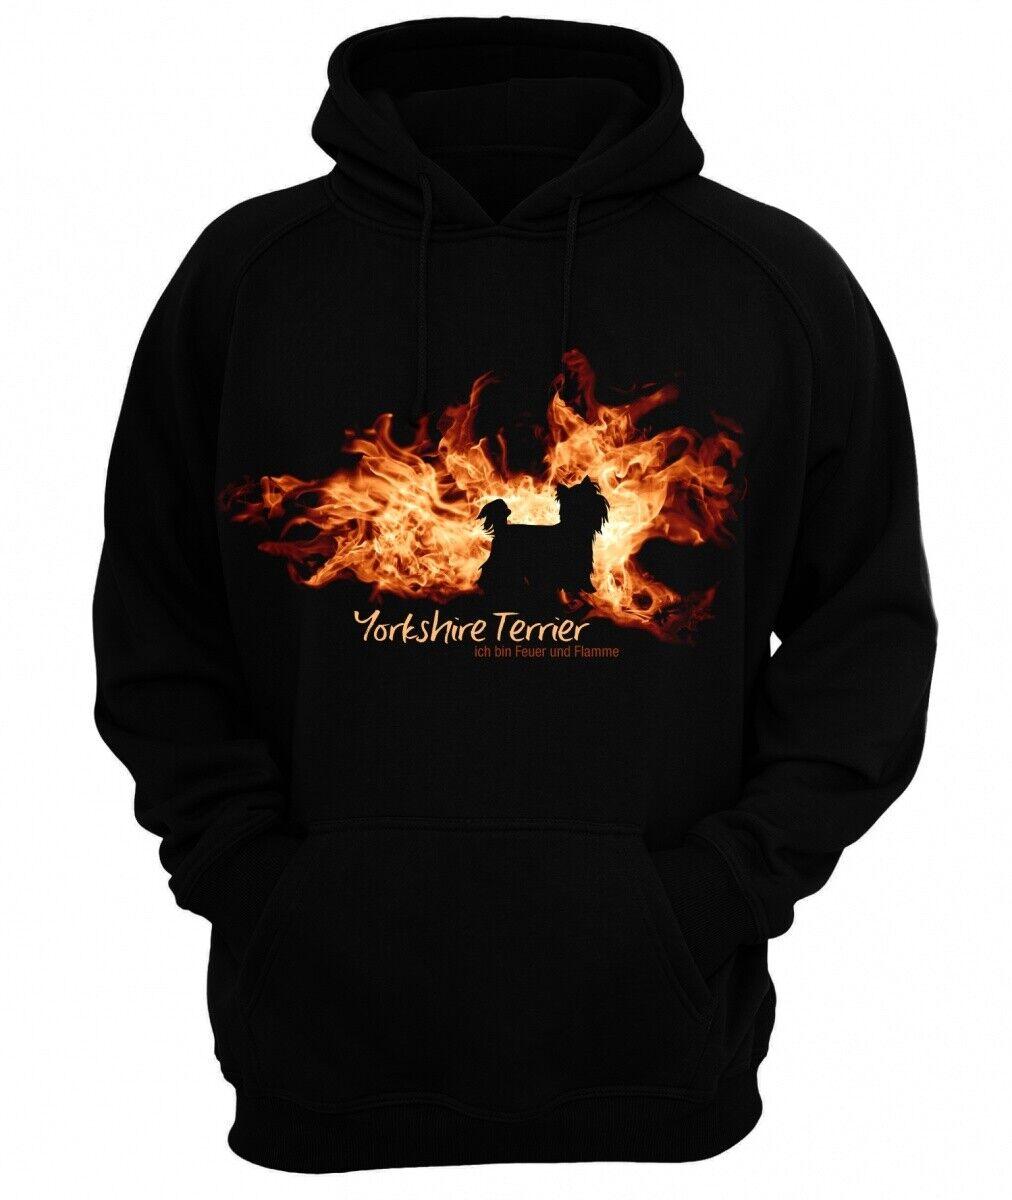 Sweatshirt YORKSHIRE TERRIER FEUER UND FLAMME by Siviwonder Hoodie